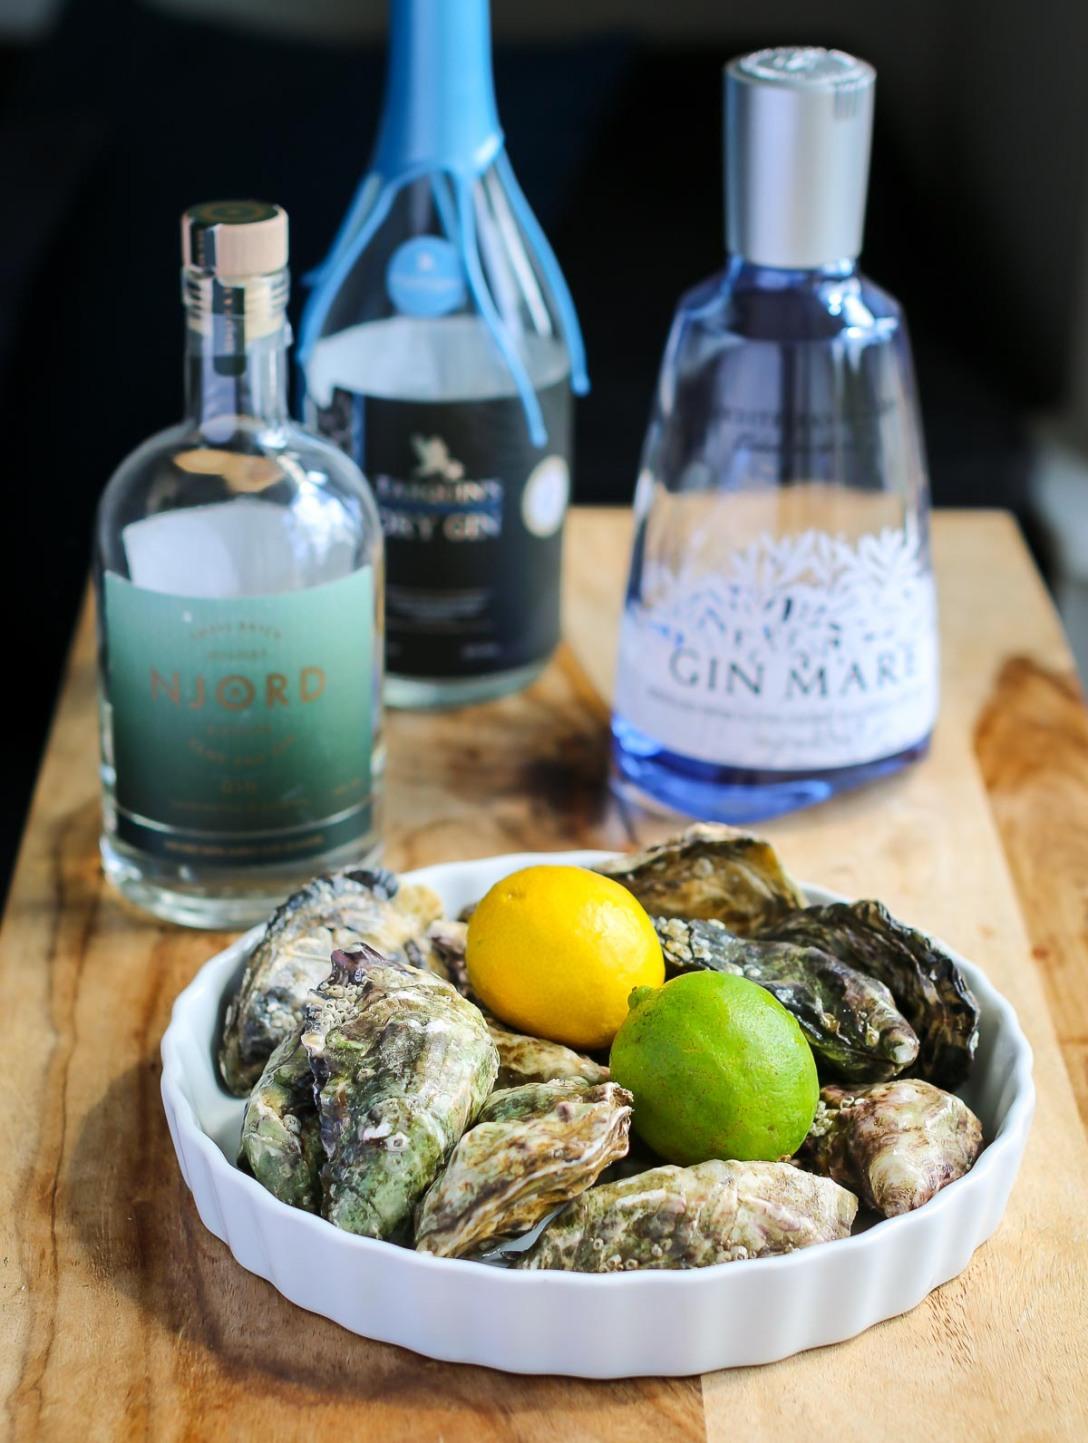 Njord Gin Sand and Sea, Tarquin's Gin, Gin Mare og en røvfuld østers. Photo by Michael Sperling.